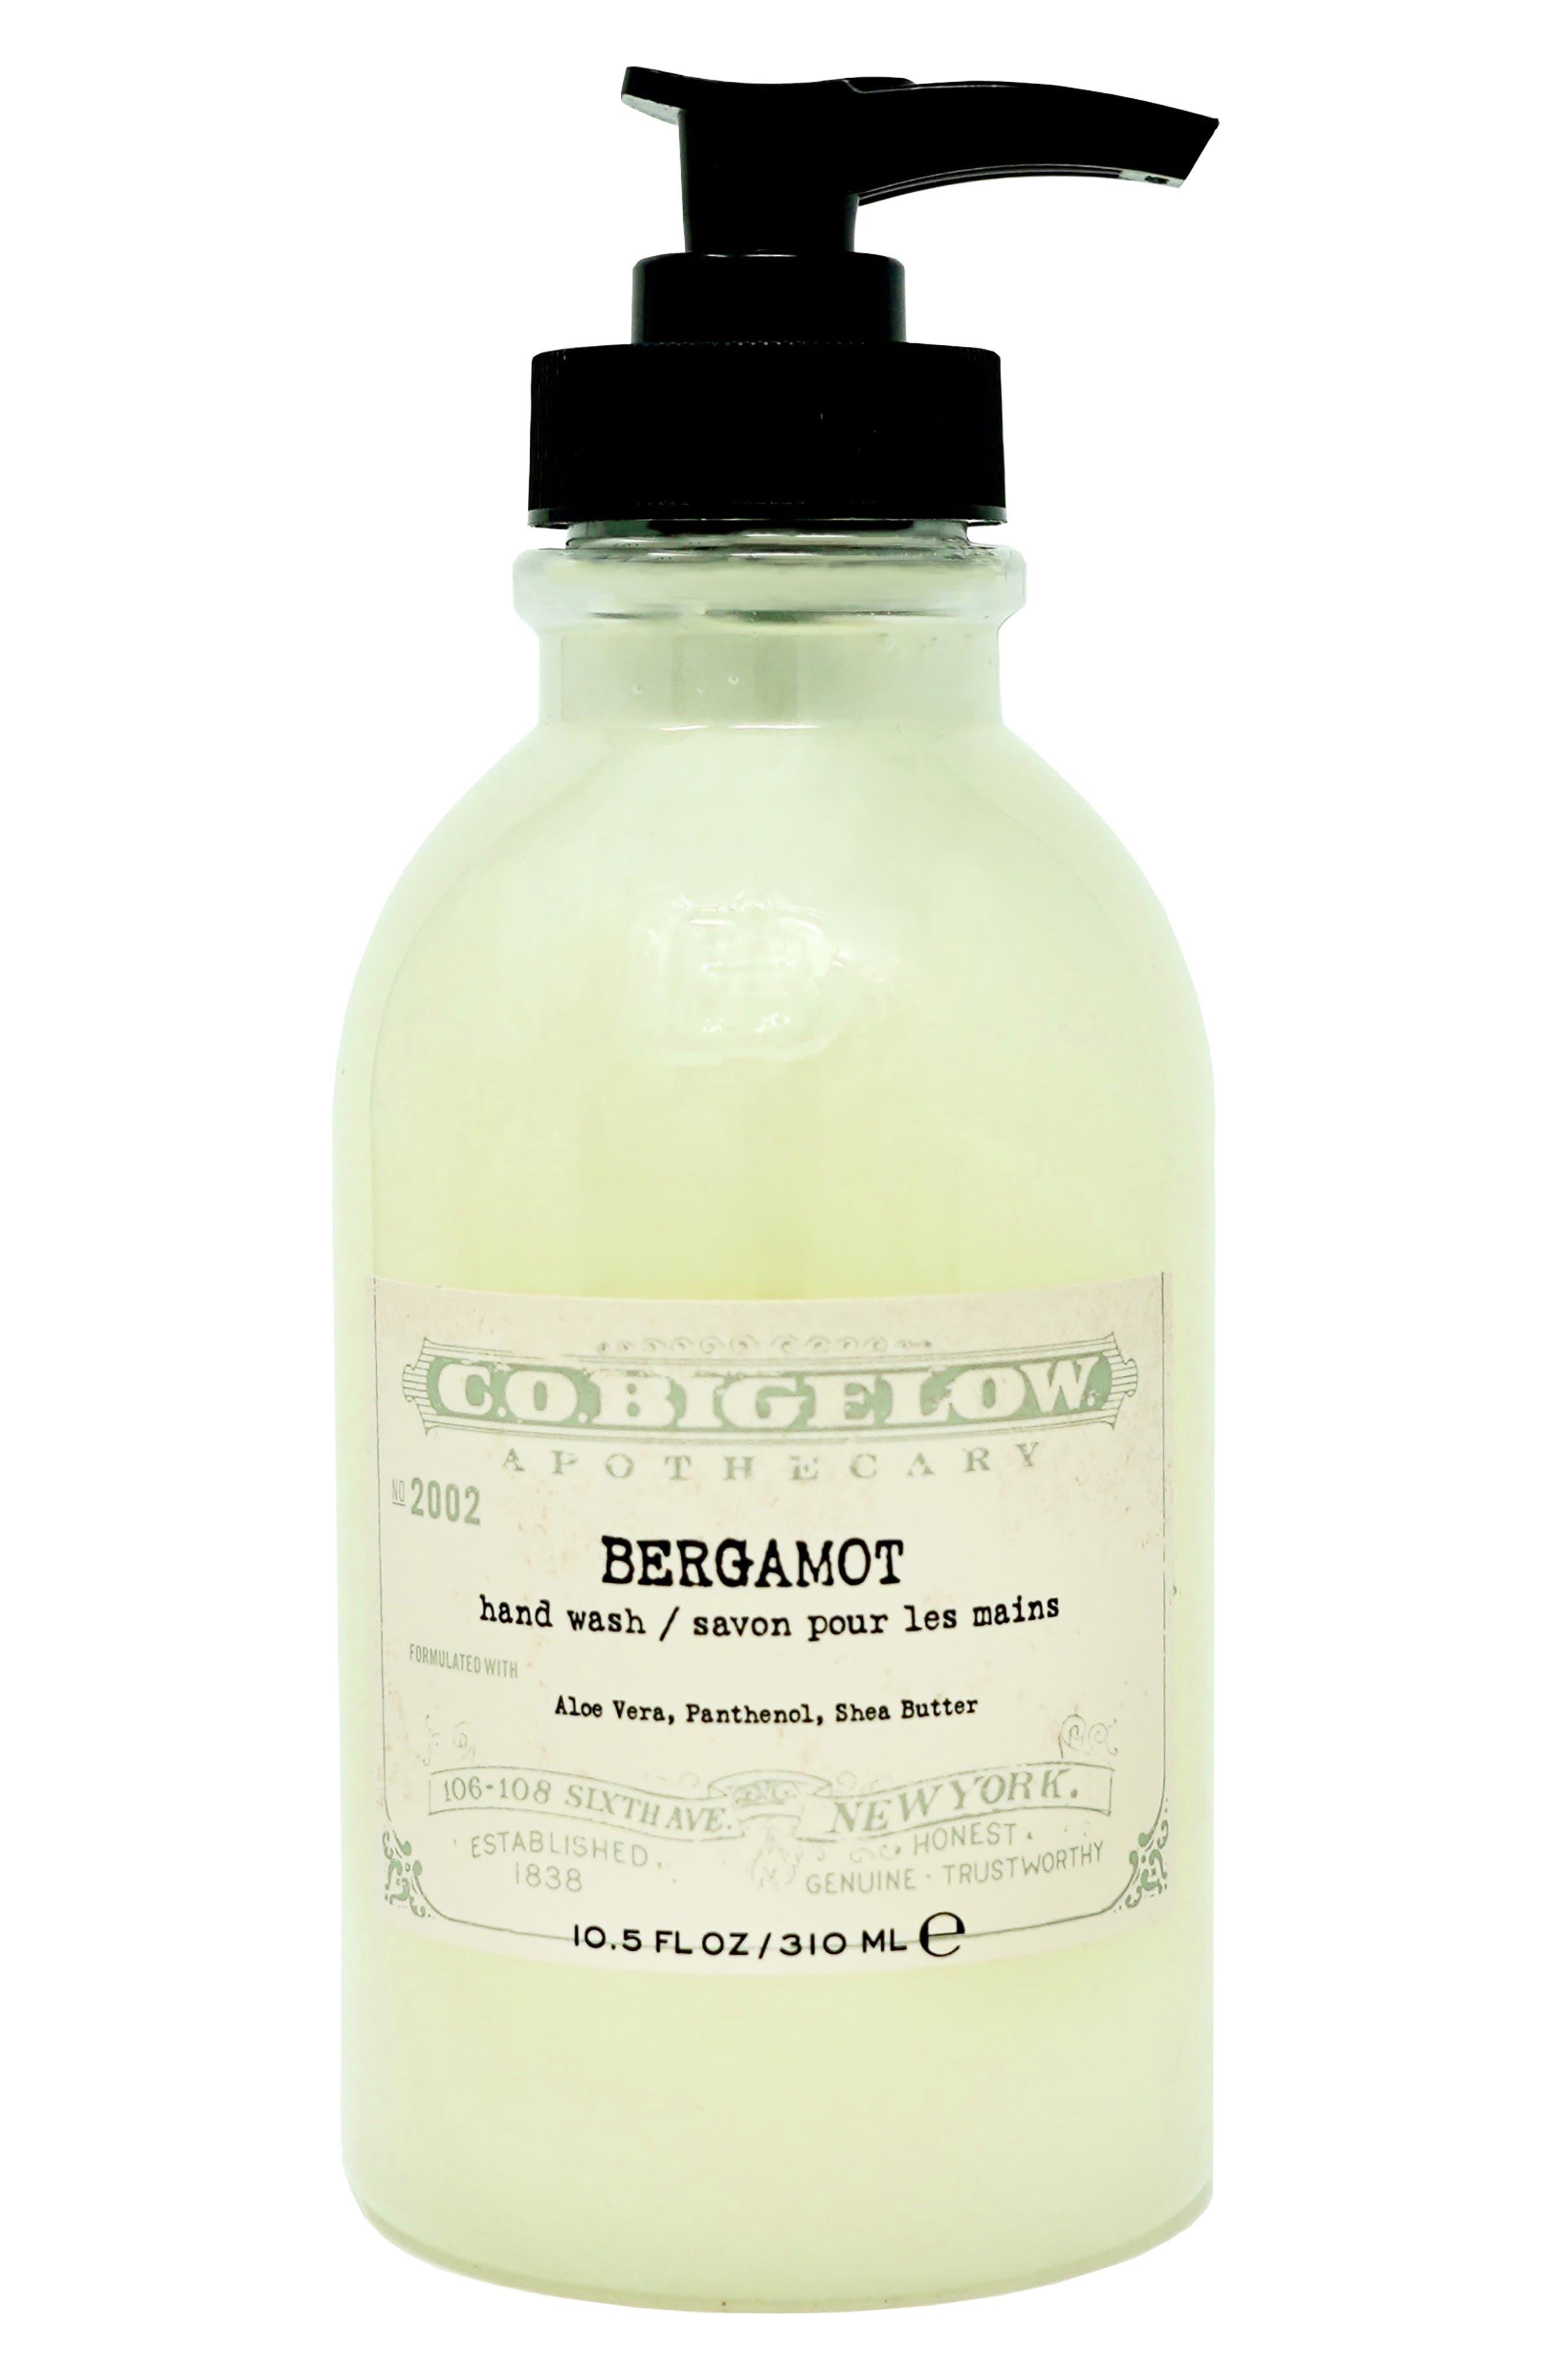 C.O. Bigelow Bergamot Hand Wash